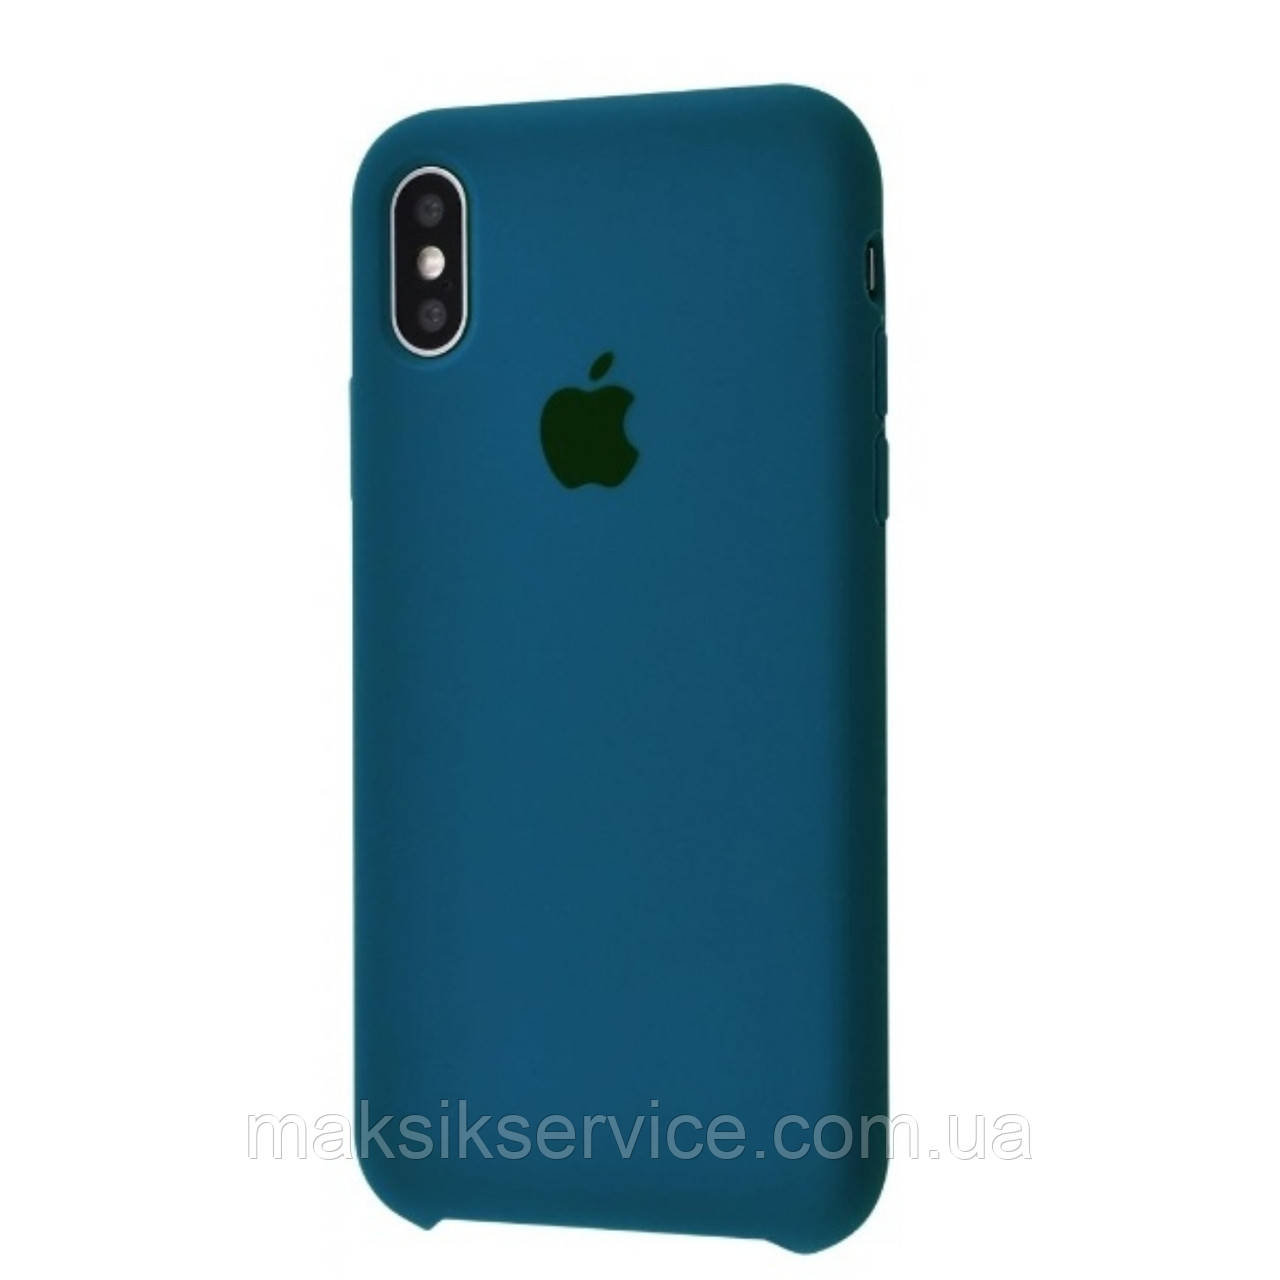 Чехол Silicone Case iPhone X/Xs cosmos blue